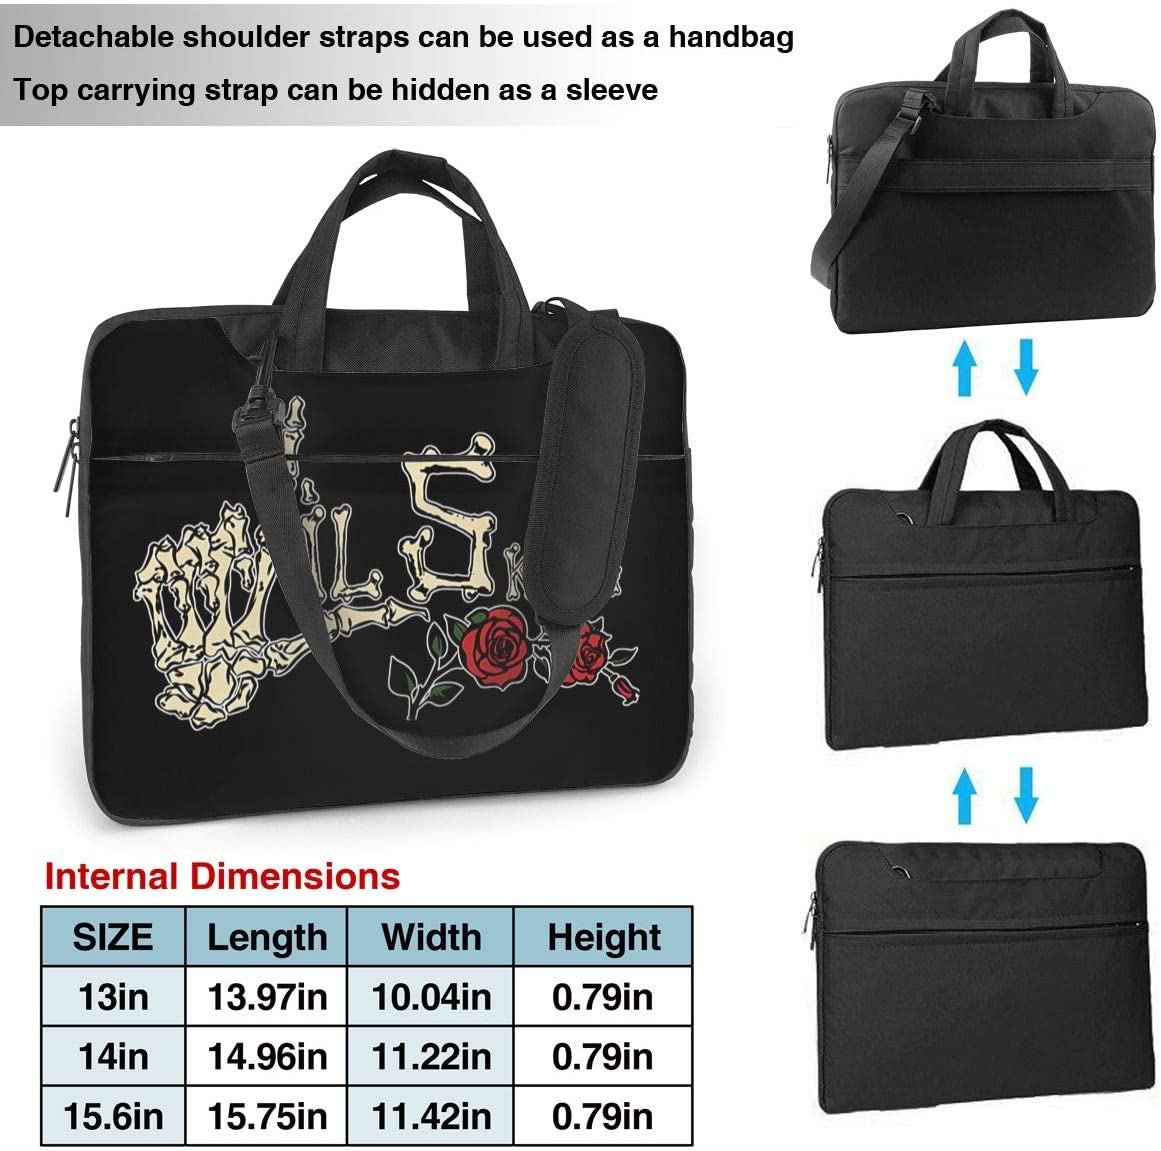 JuaoHuan Lil Skies Laptop Shoulder Messenger Bag Case Briefcase Sleeve for 13 Inch 14 Inch 15.6 Inch Laptop Case 13 Inch